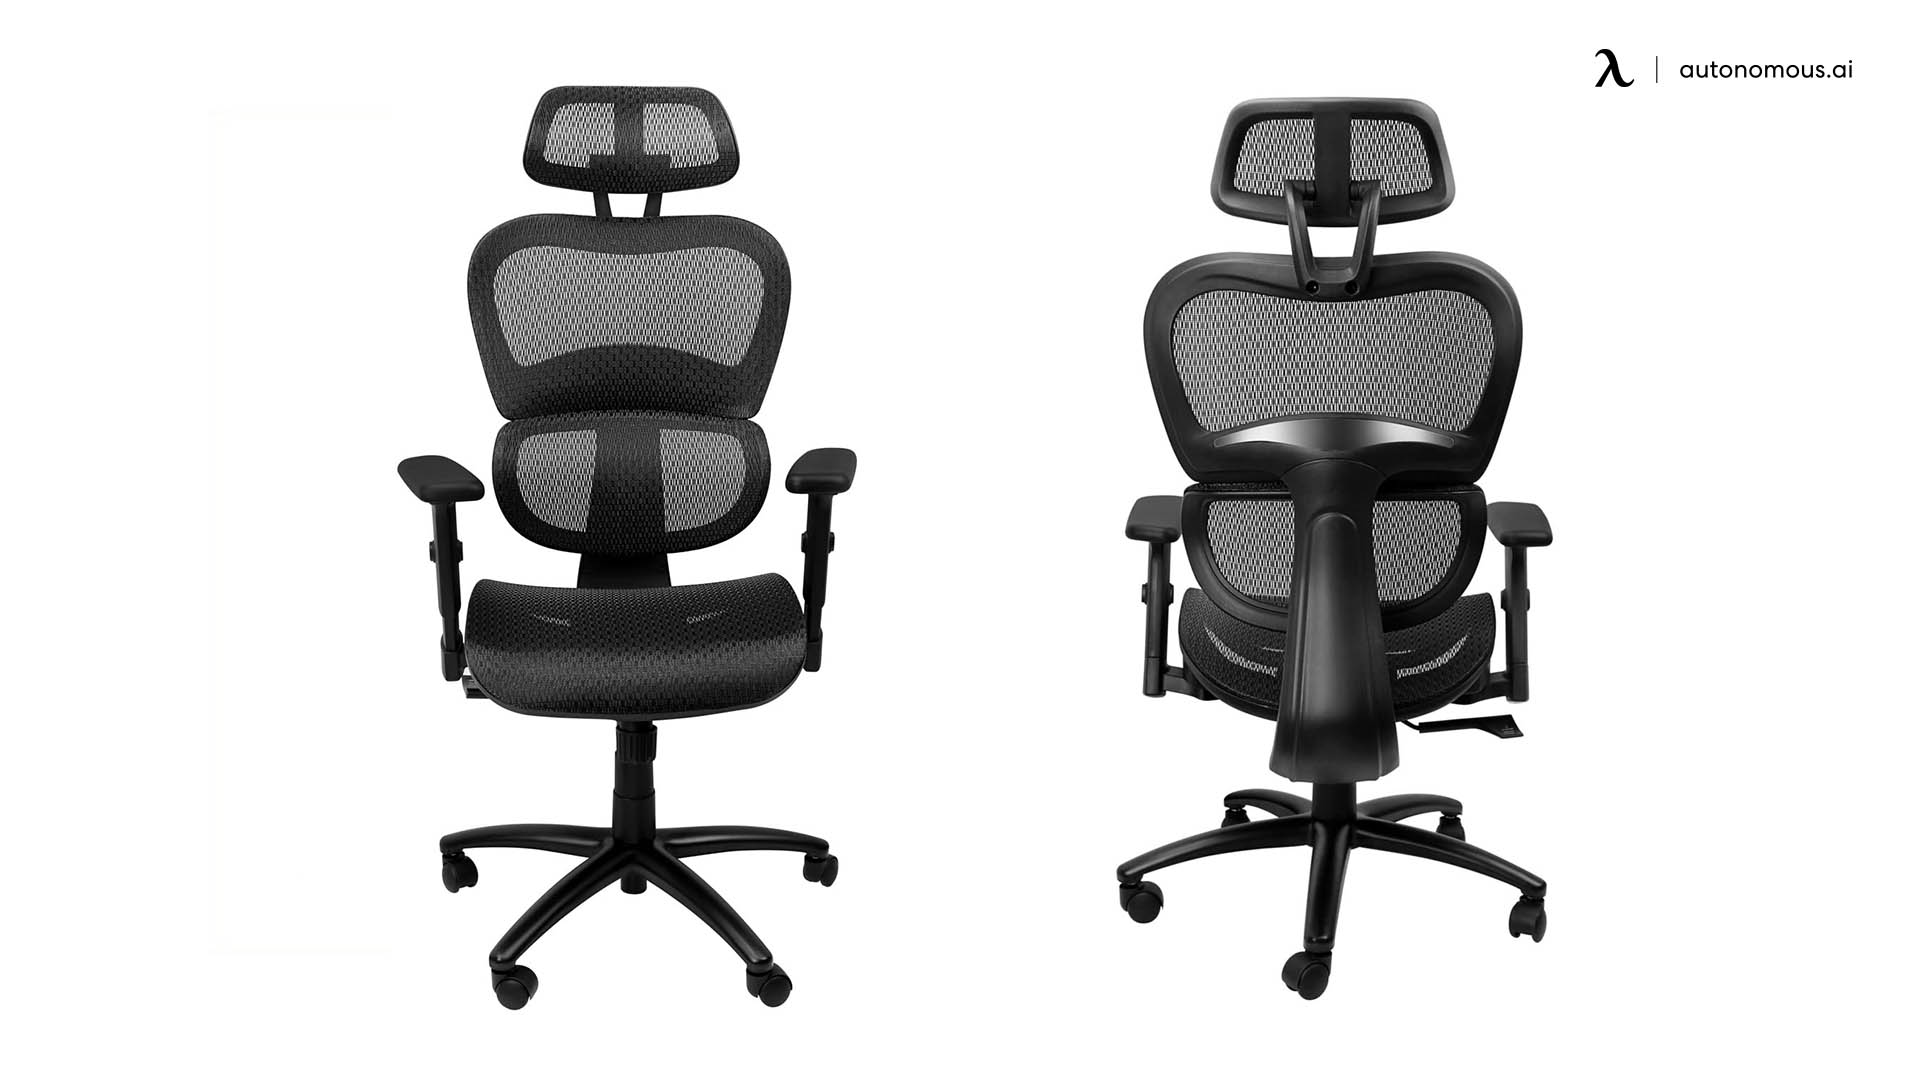 the Ergousit ergonomic chair